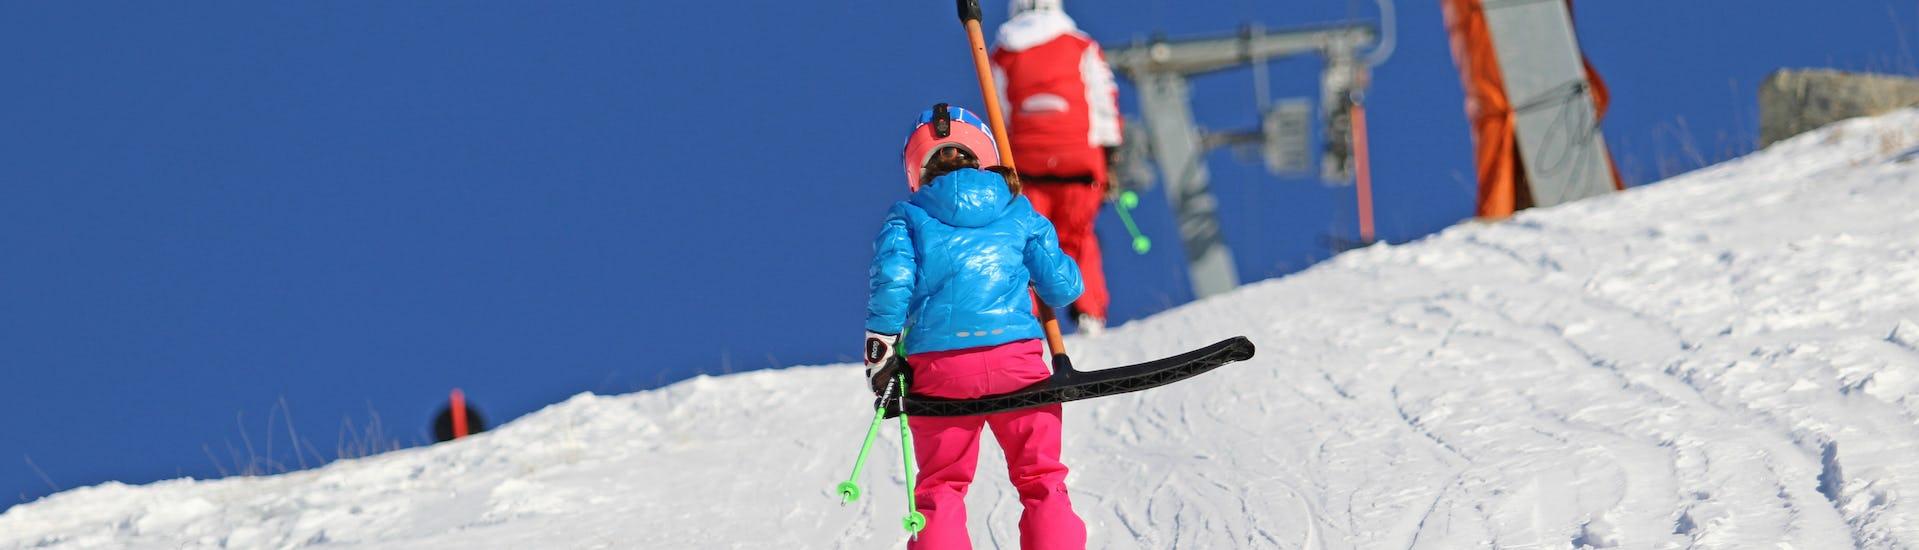 Ski Instructor Private for Kids in Samnaun/Ischgl